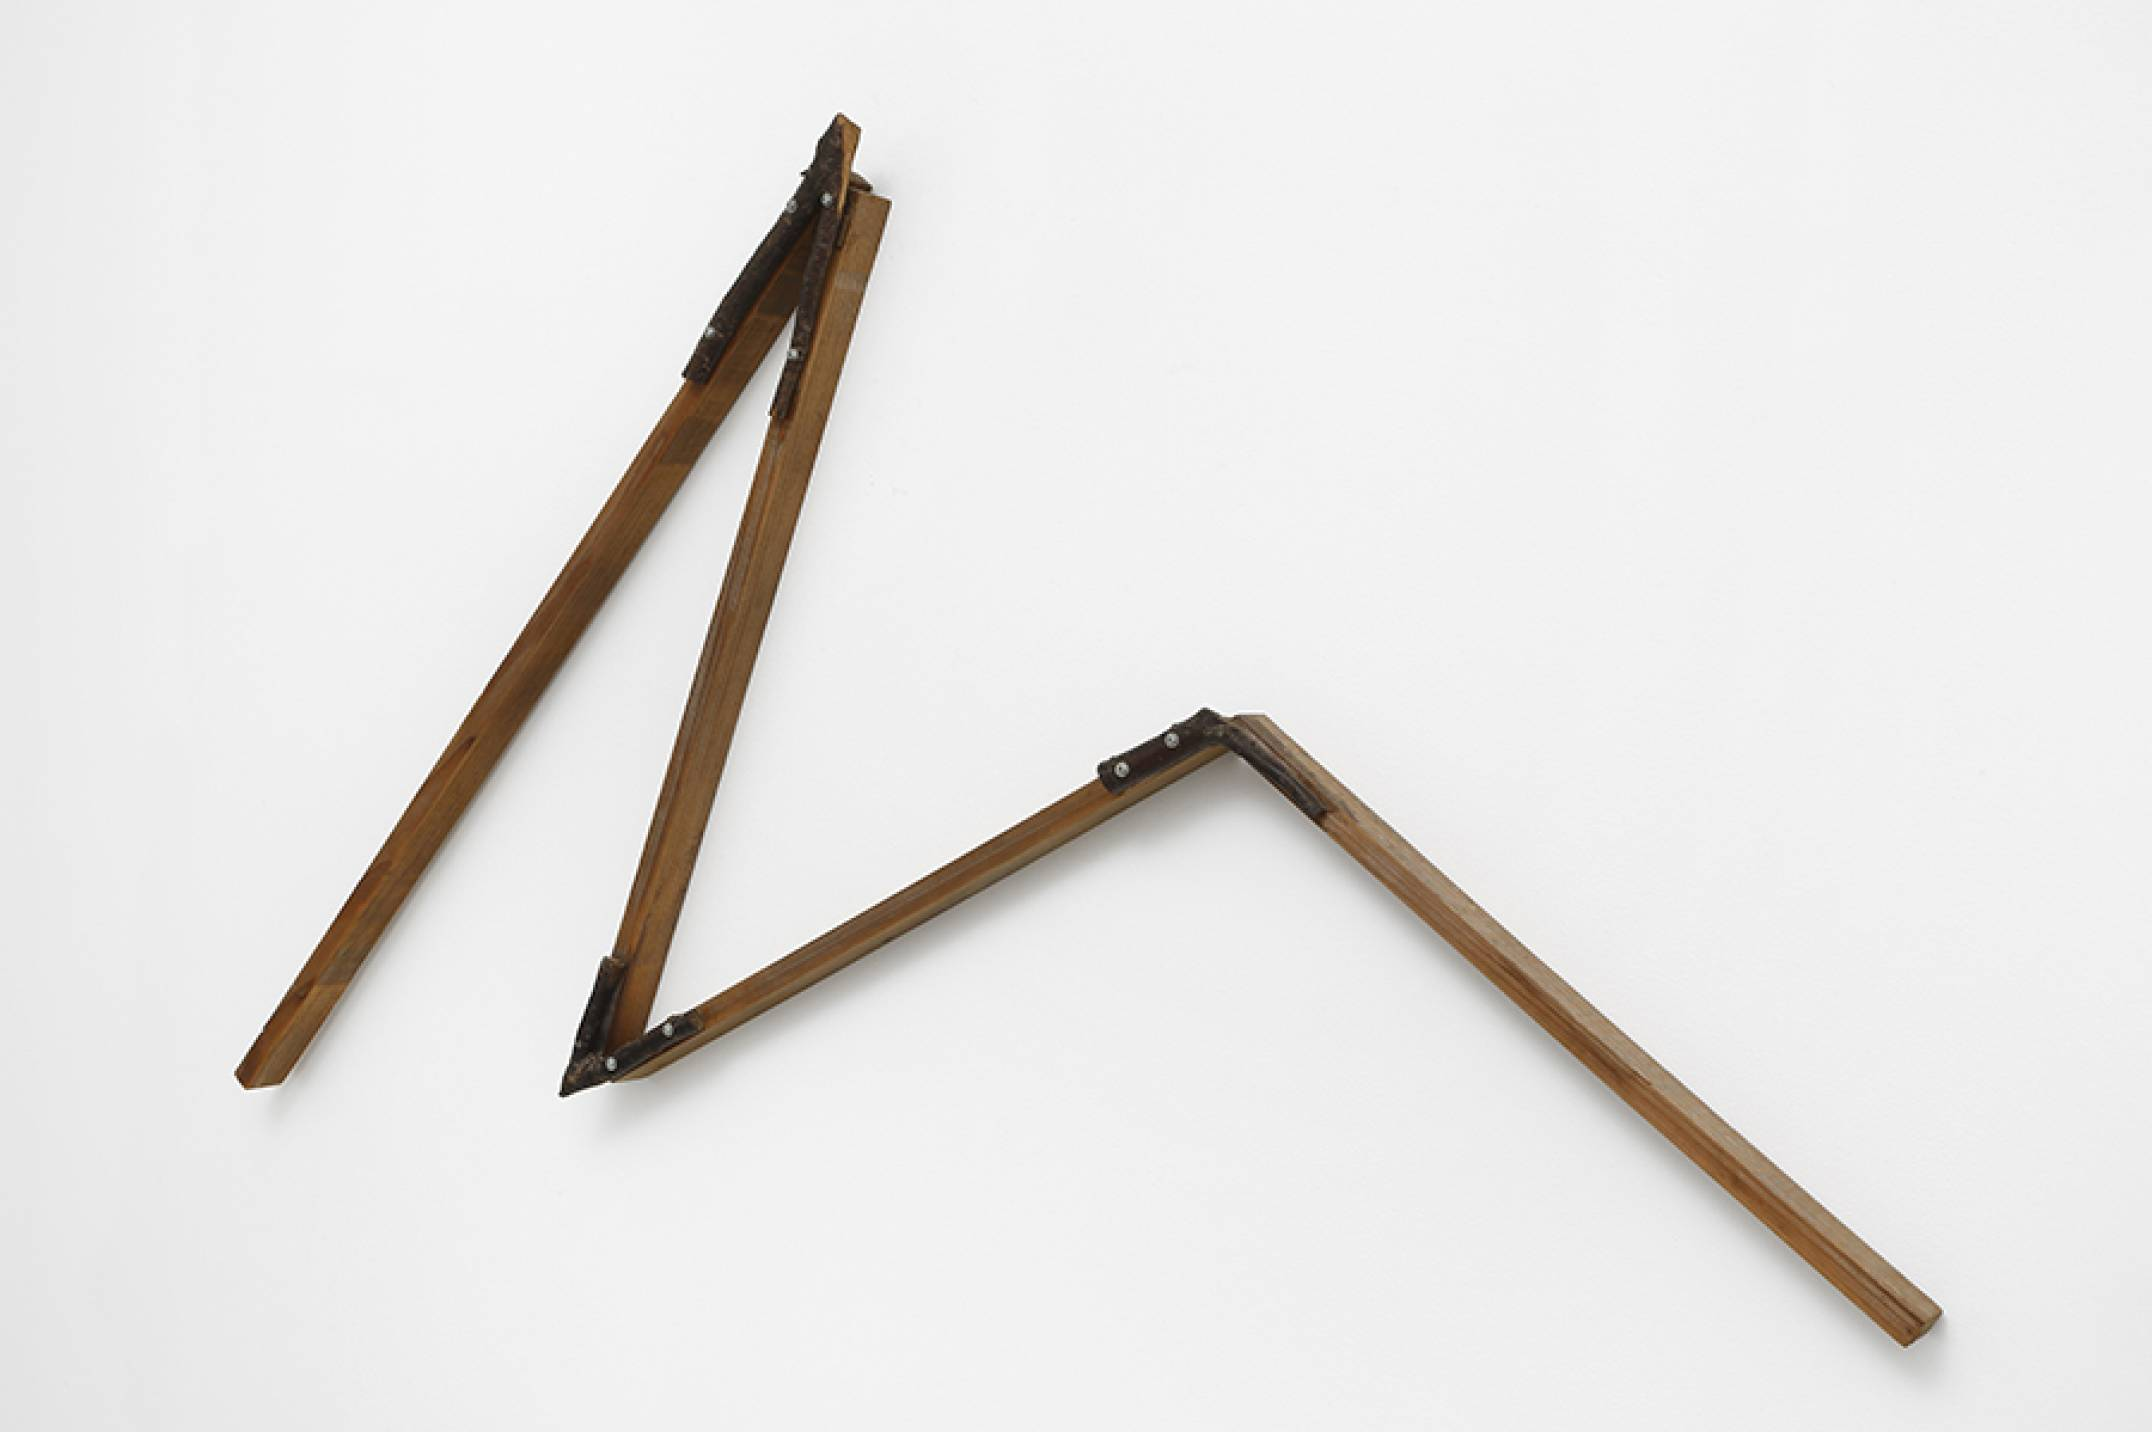 Kishio Suga, <em>Crooked Positioning—Y</em>, 1986, wood, branches, screws, 114,3 × 57,8 × 6 cm - Mendes Wood DM